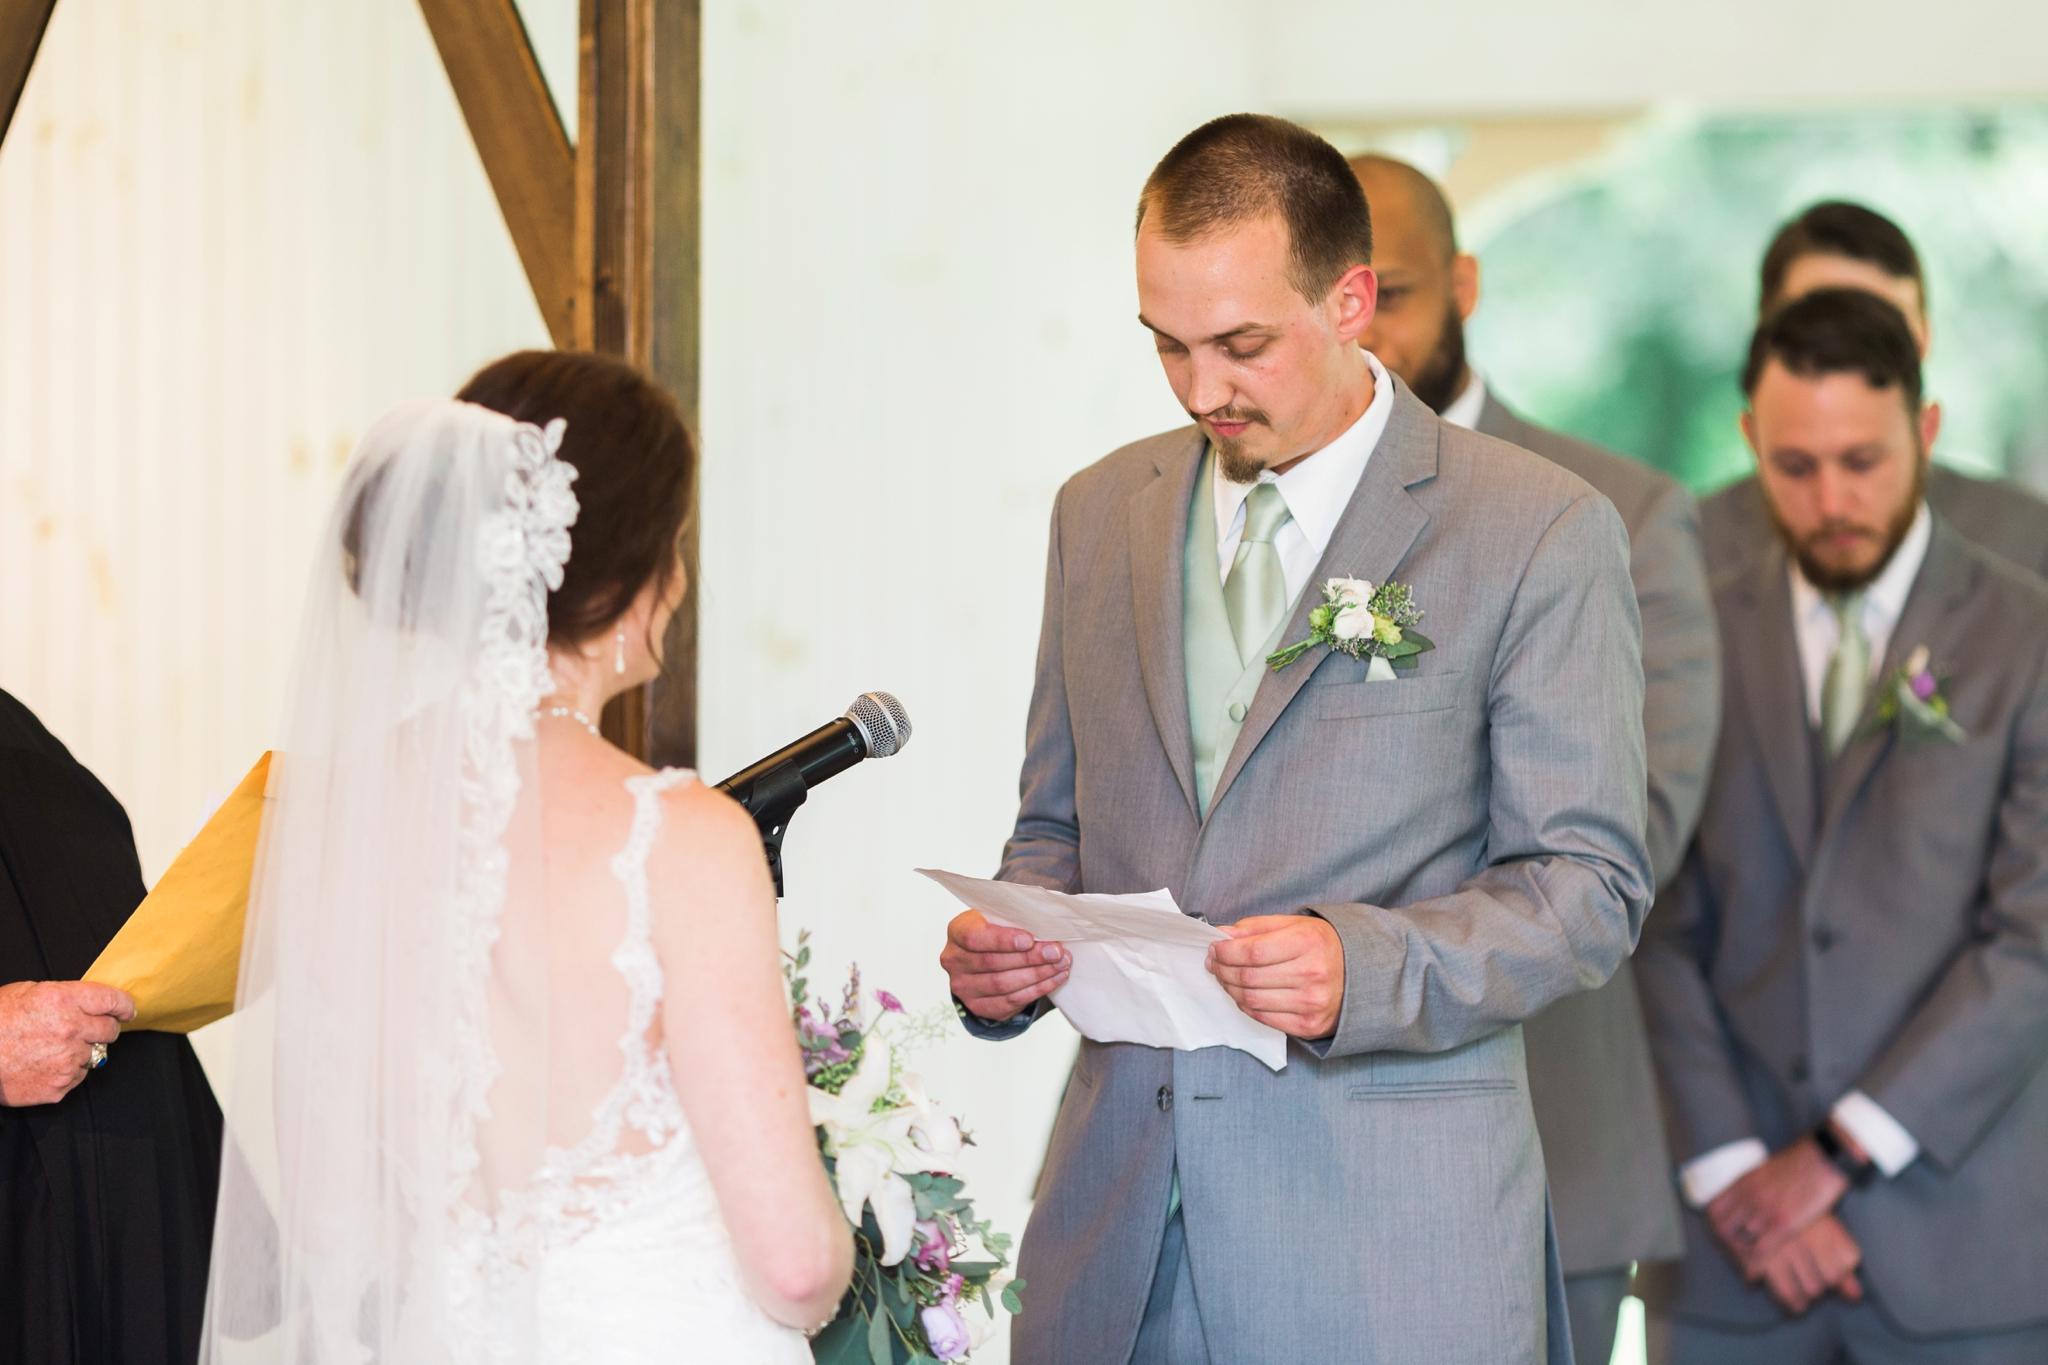 Emily Grace Photography, Lancaster PA Wedding Photographer, Moonstone Manor, Beer Garden Theme Wedding